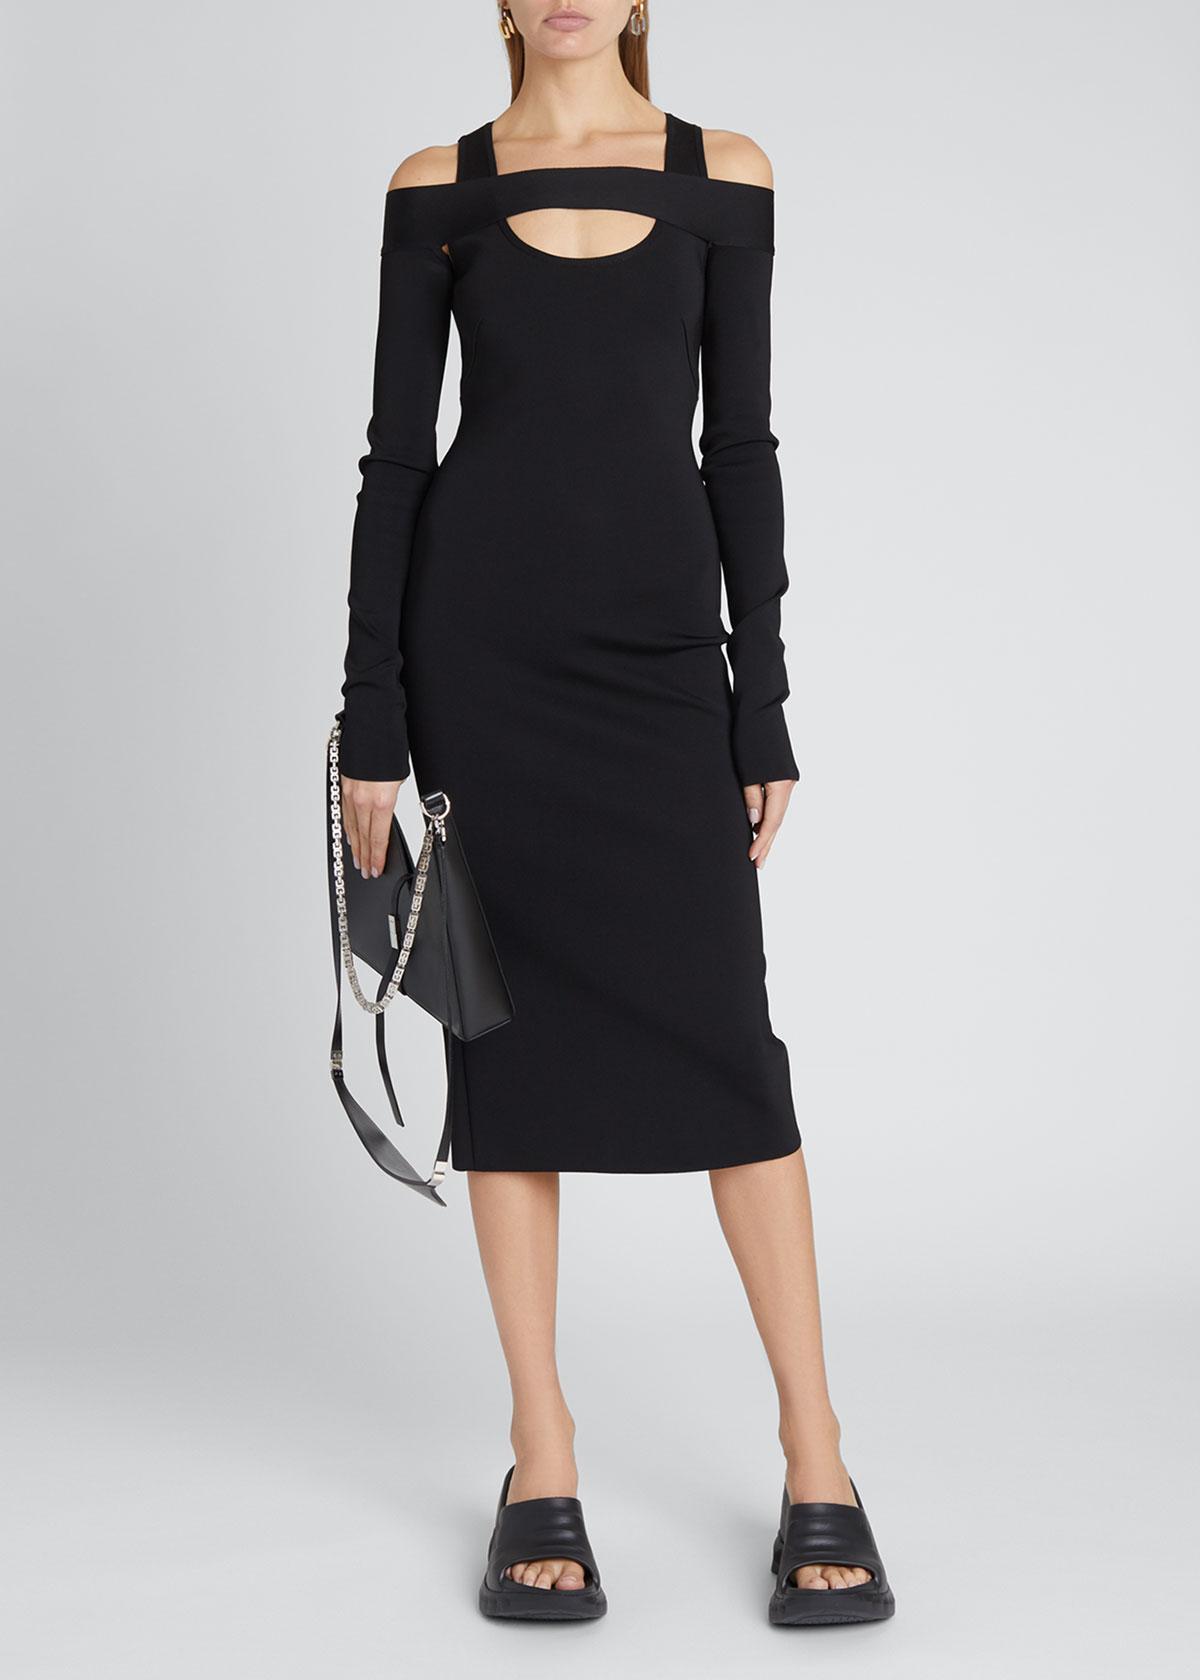 Givenchy Dresses 18GG KNIT SQUARE-SHOULDER MIDI DRESS